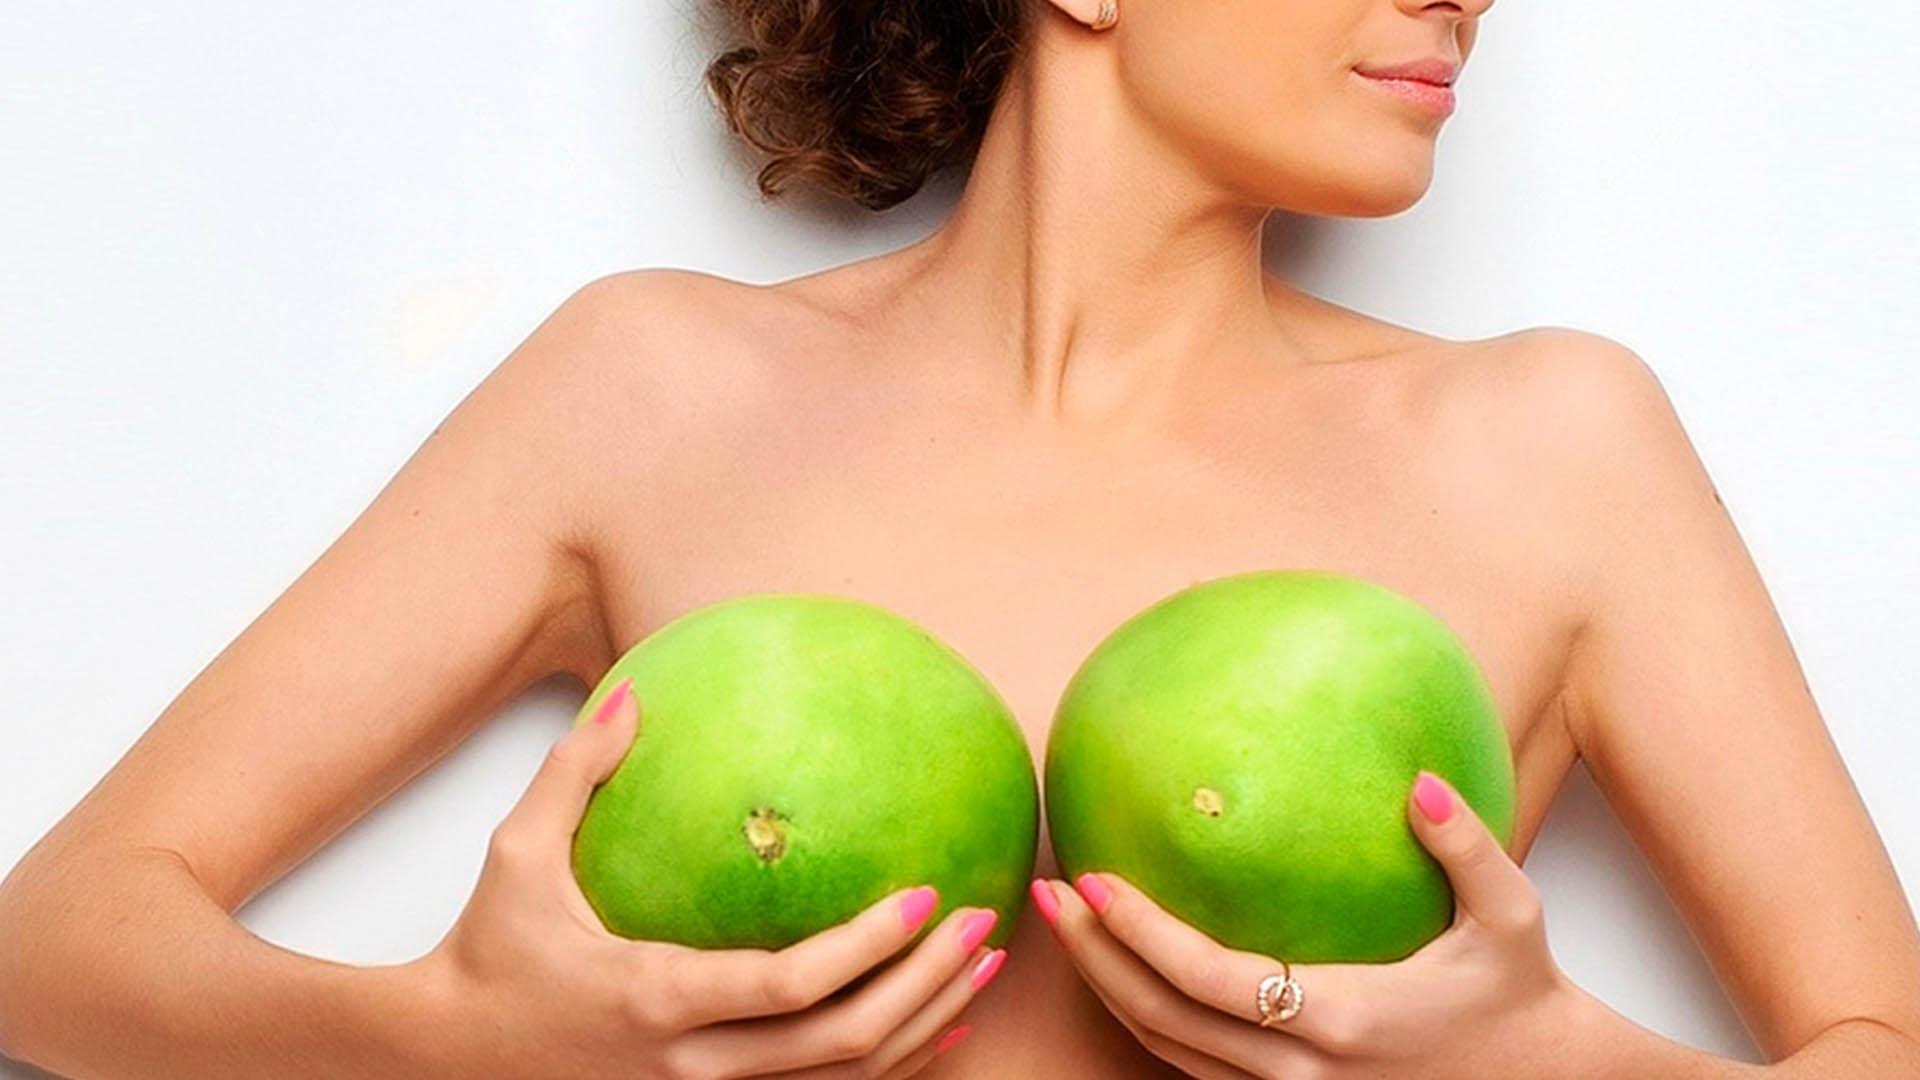 French nudist beach sex